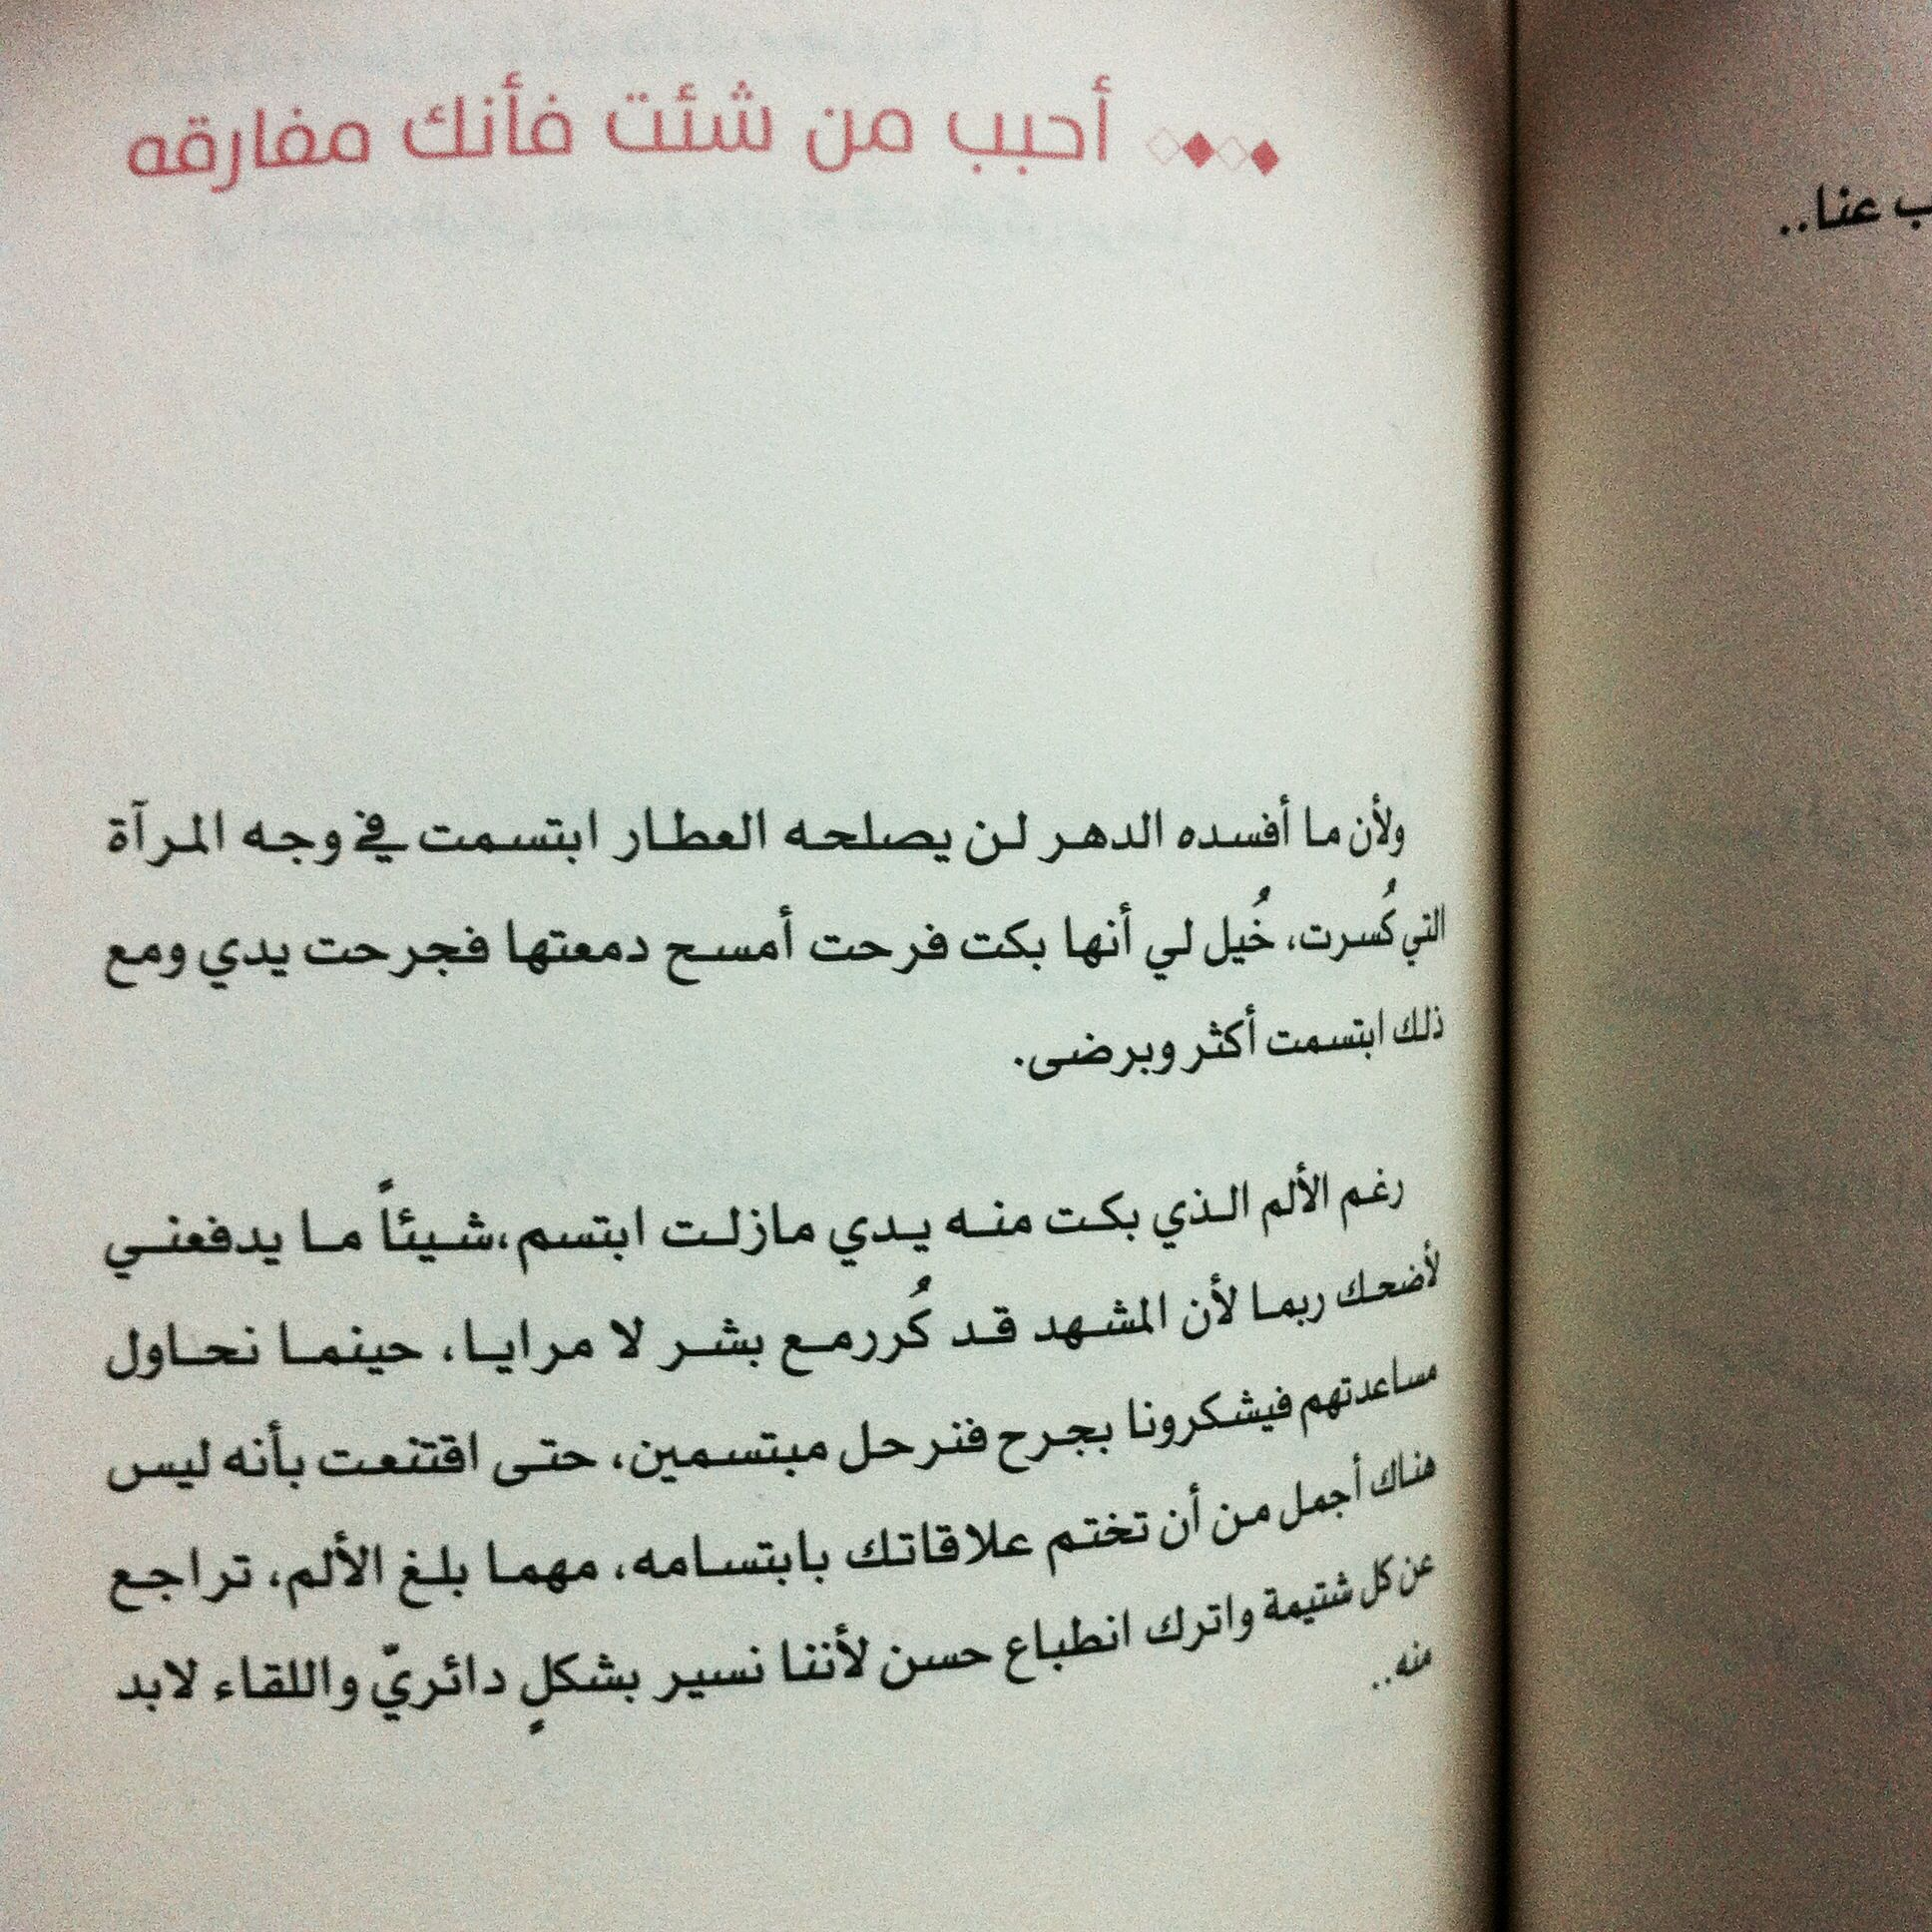 Pin By Nourah Abdullah On ماذا بعد أحبك بقلم ندى آل رشيد Bullet Journal Personalized Items Supplies